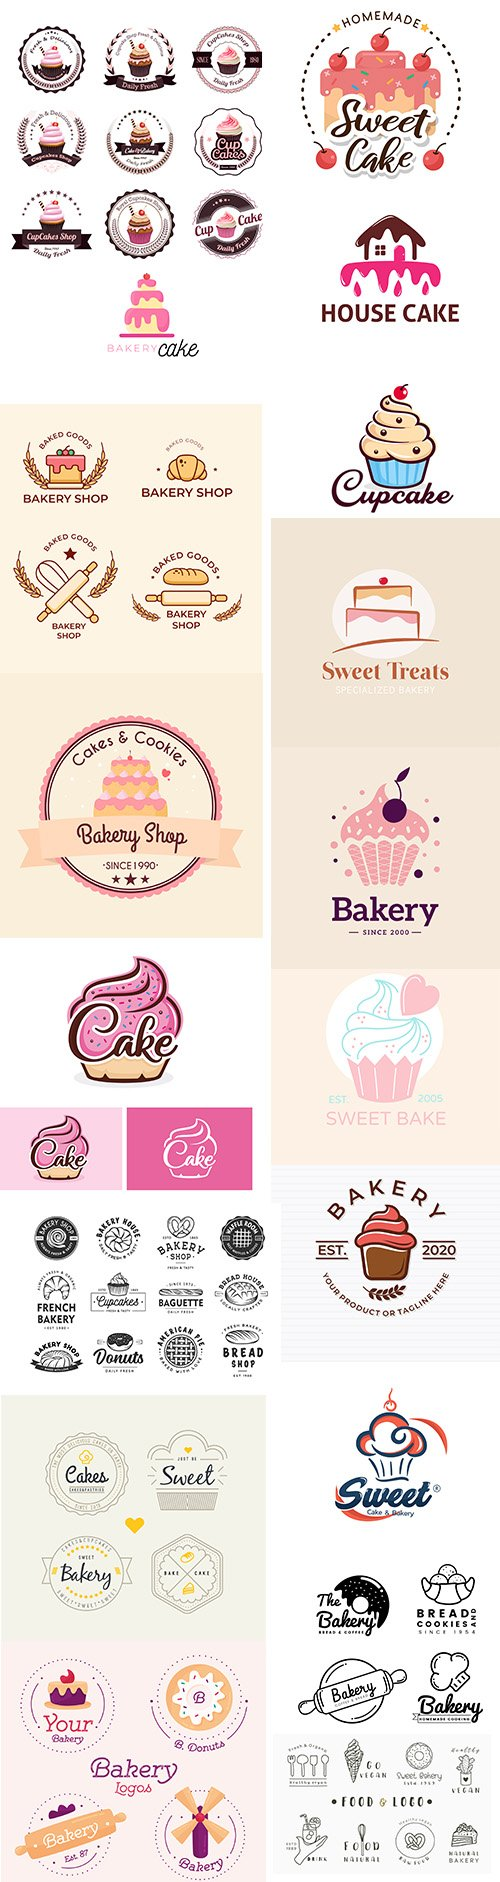 Bakery cake logo template collection